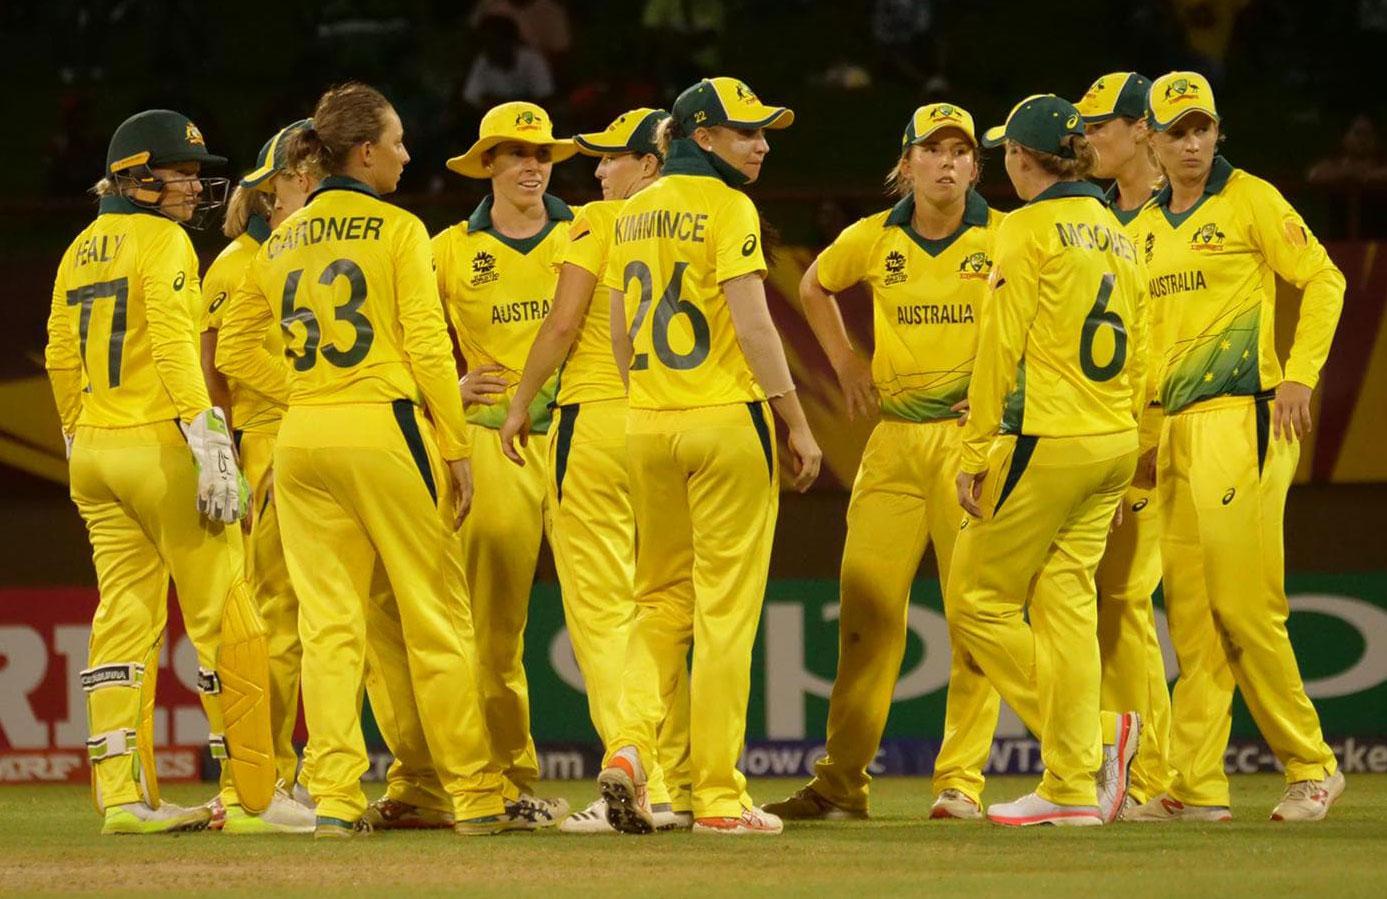 Australia players celebrate a wicket // Cricket Network